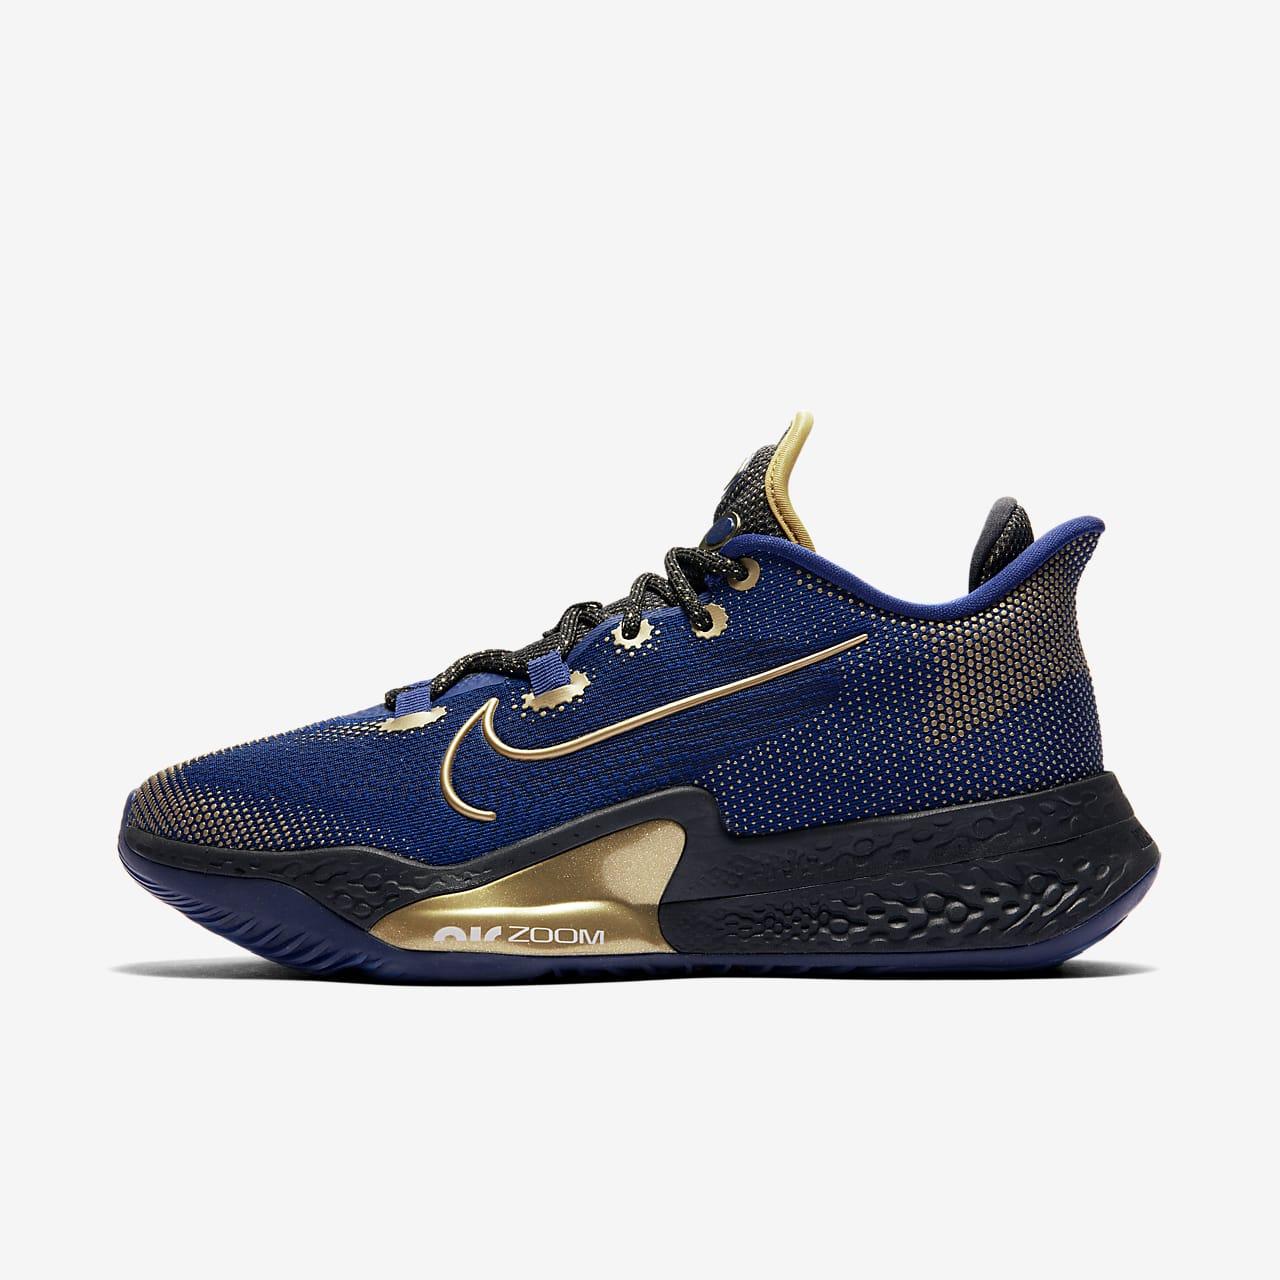 Nike Air Zoom BB NXT Basketbalschoen